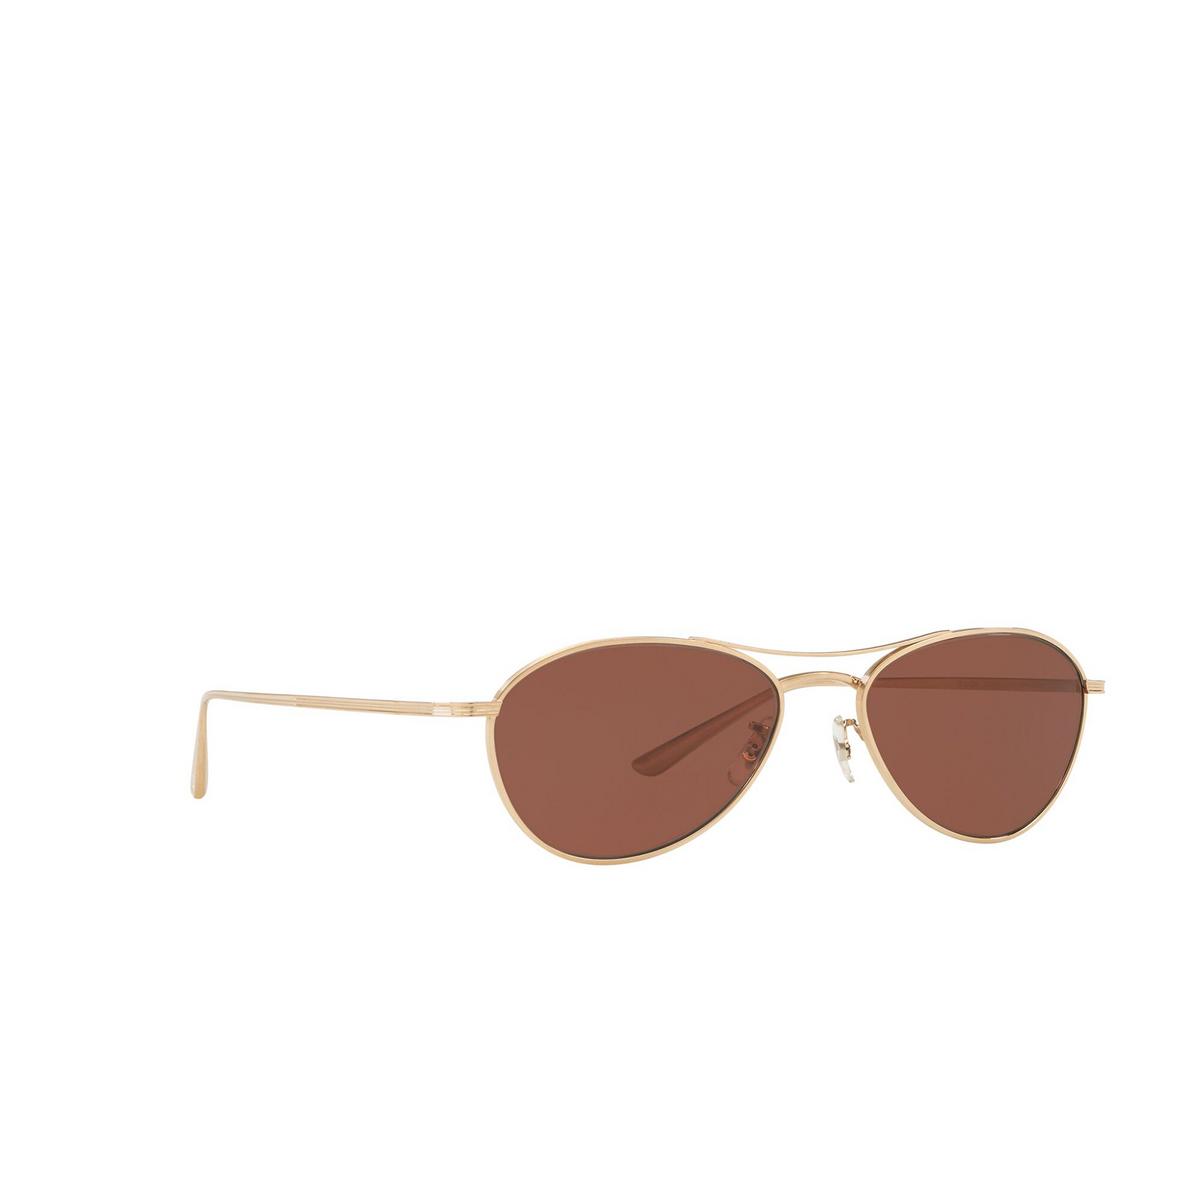 Oliver Peoples® Aviator Sunglasses: Aero La OV1245ST color White Gold 5292C5 - three-quarters view.